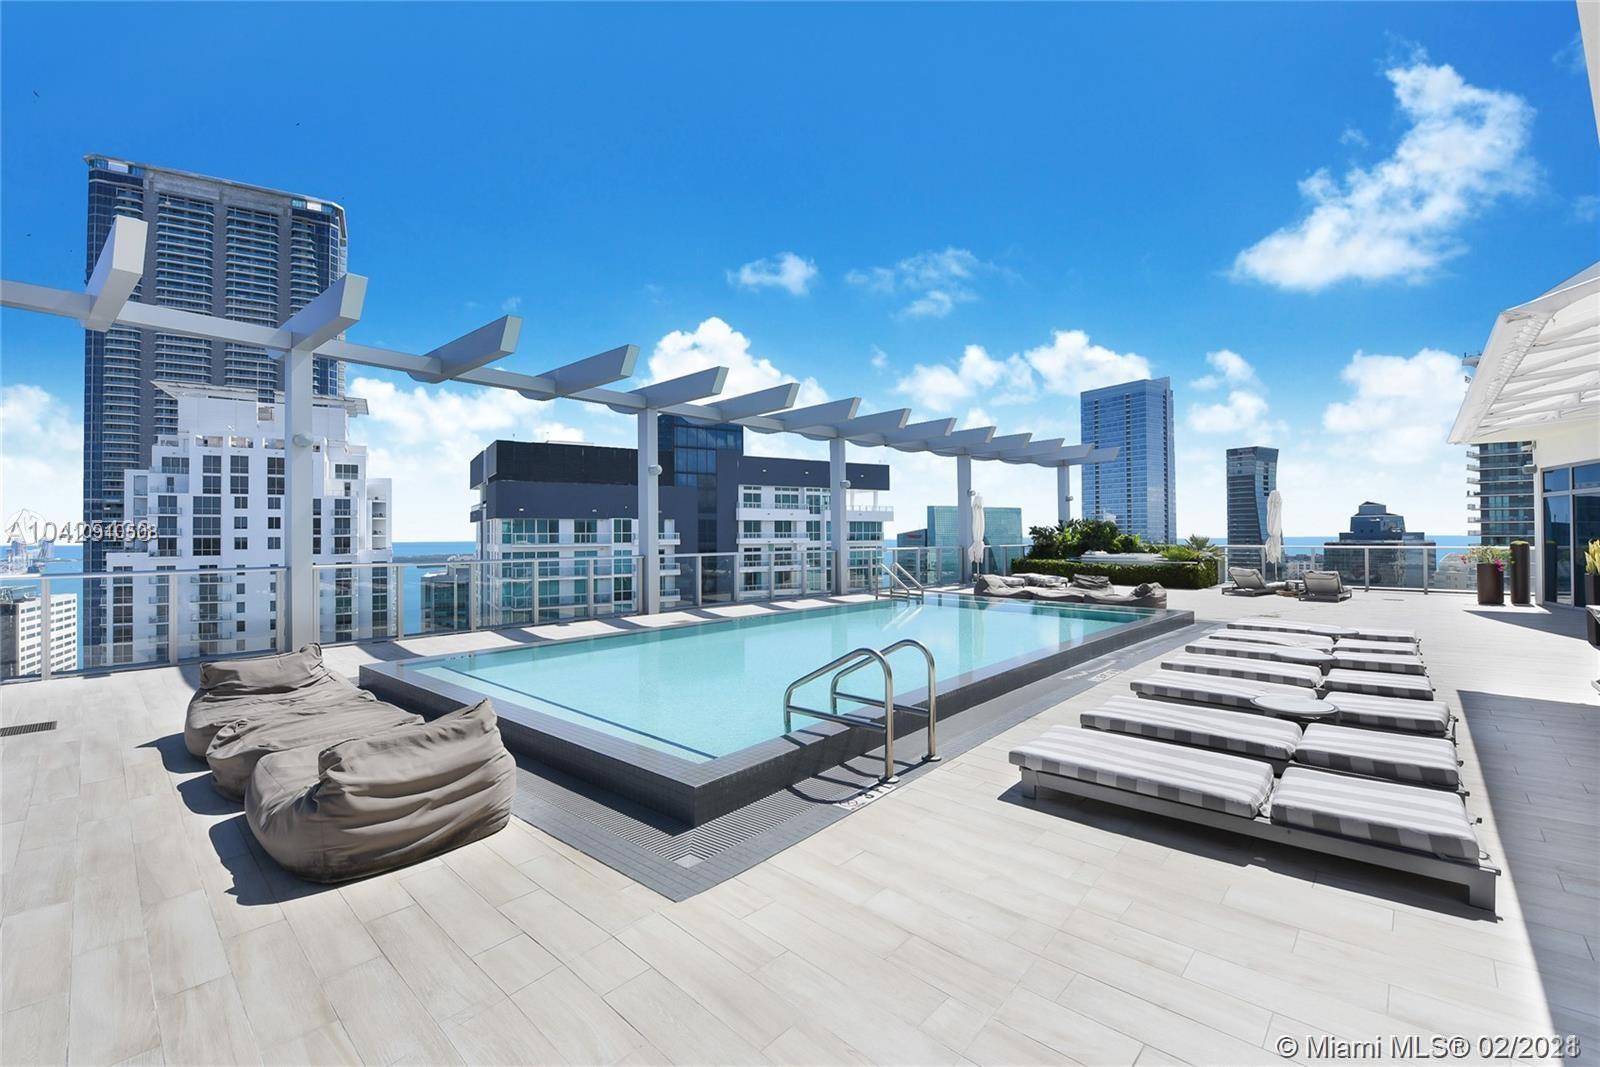 1100 Millecento #1406 - 1100 S Miami Ave #1406, Miami, FL 33130